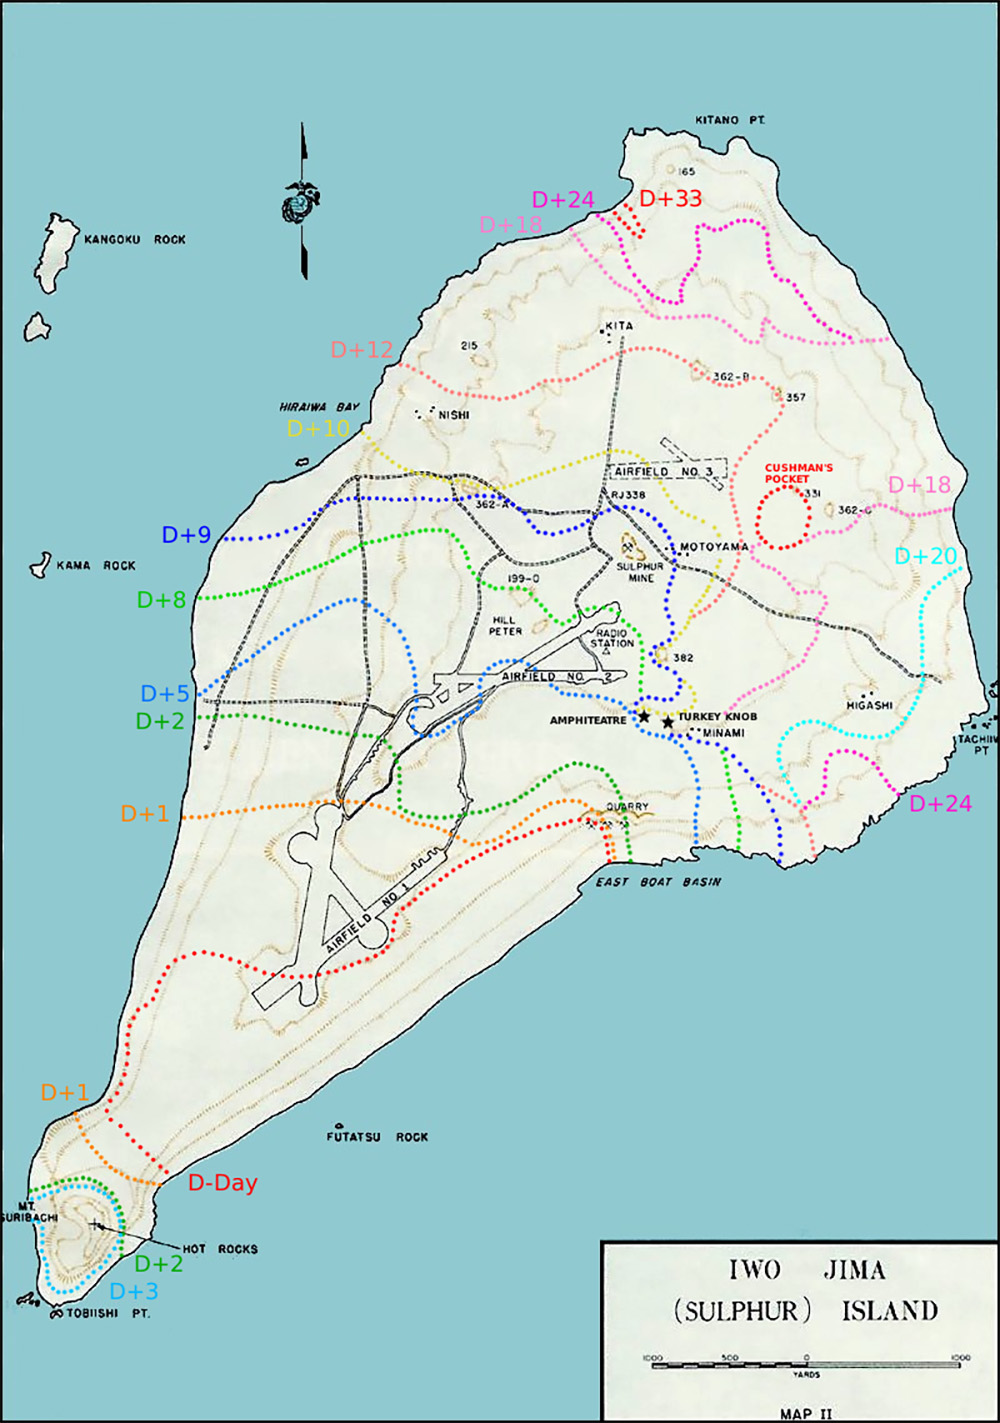 Iwo Jima - Turkey Knob